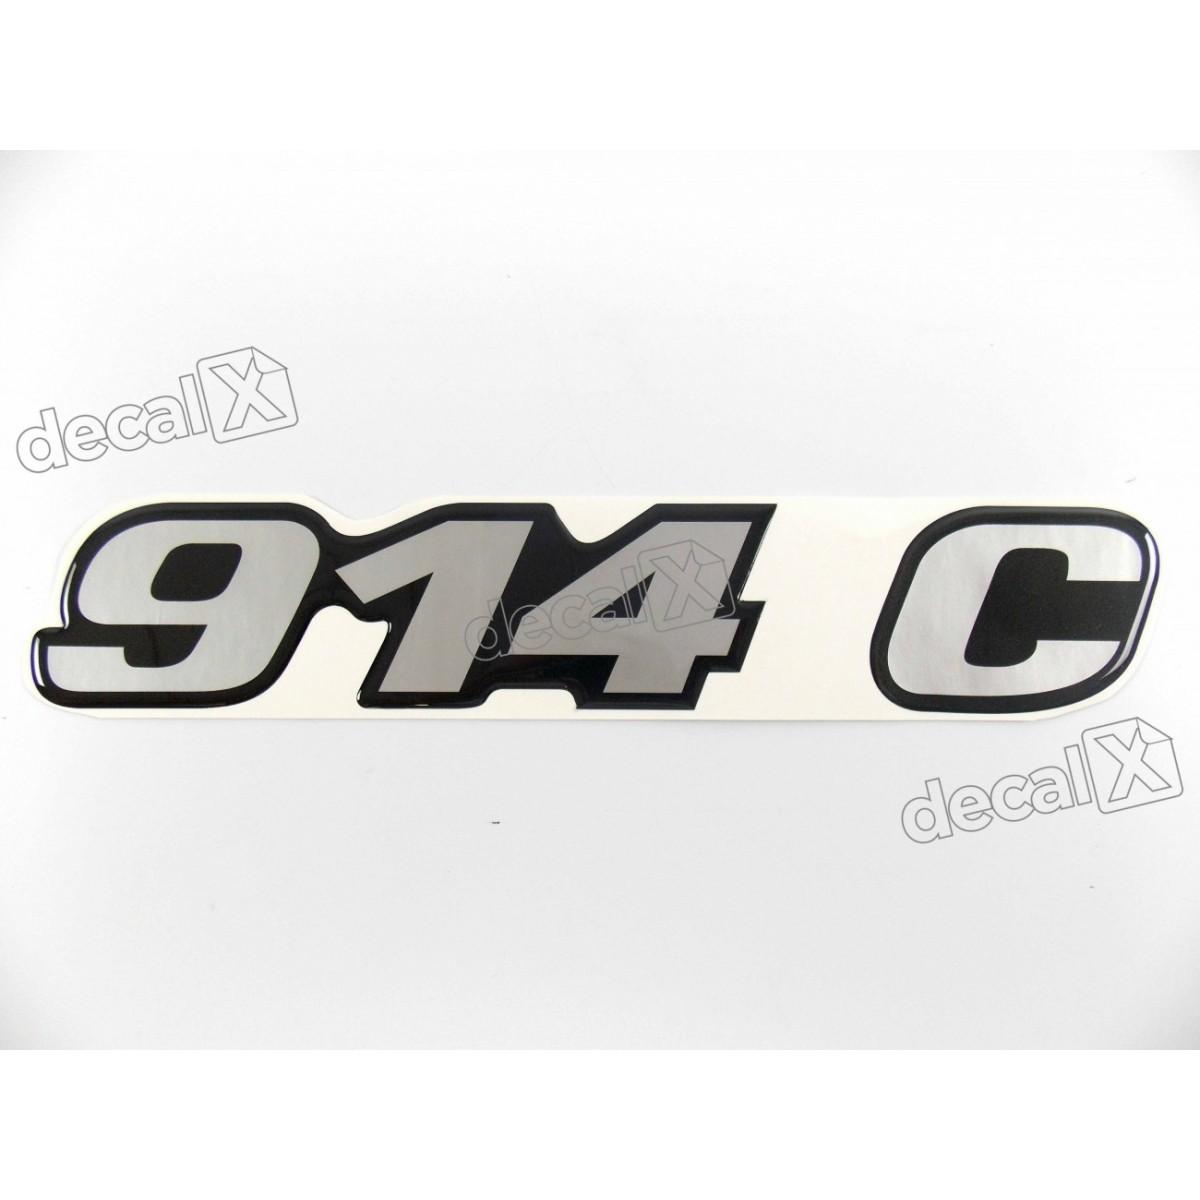 Adesivo Emblema Resinado Mercedes 914 C Cm13 Decalx